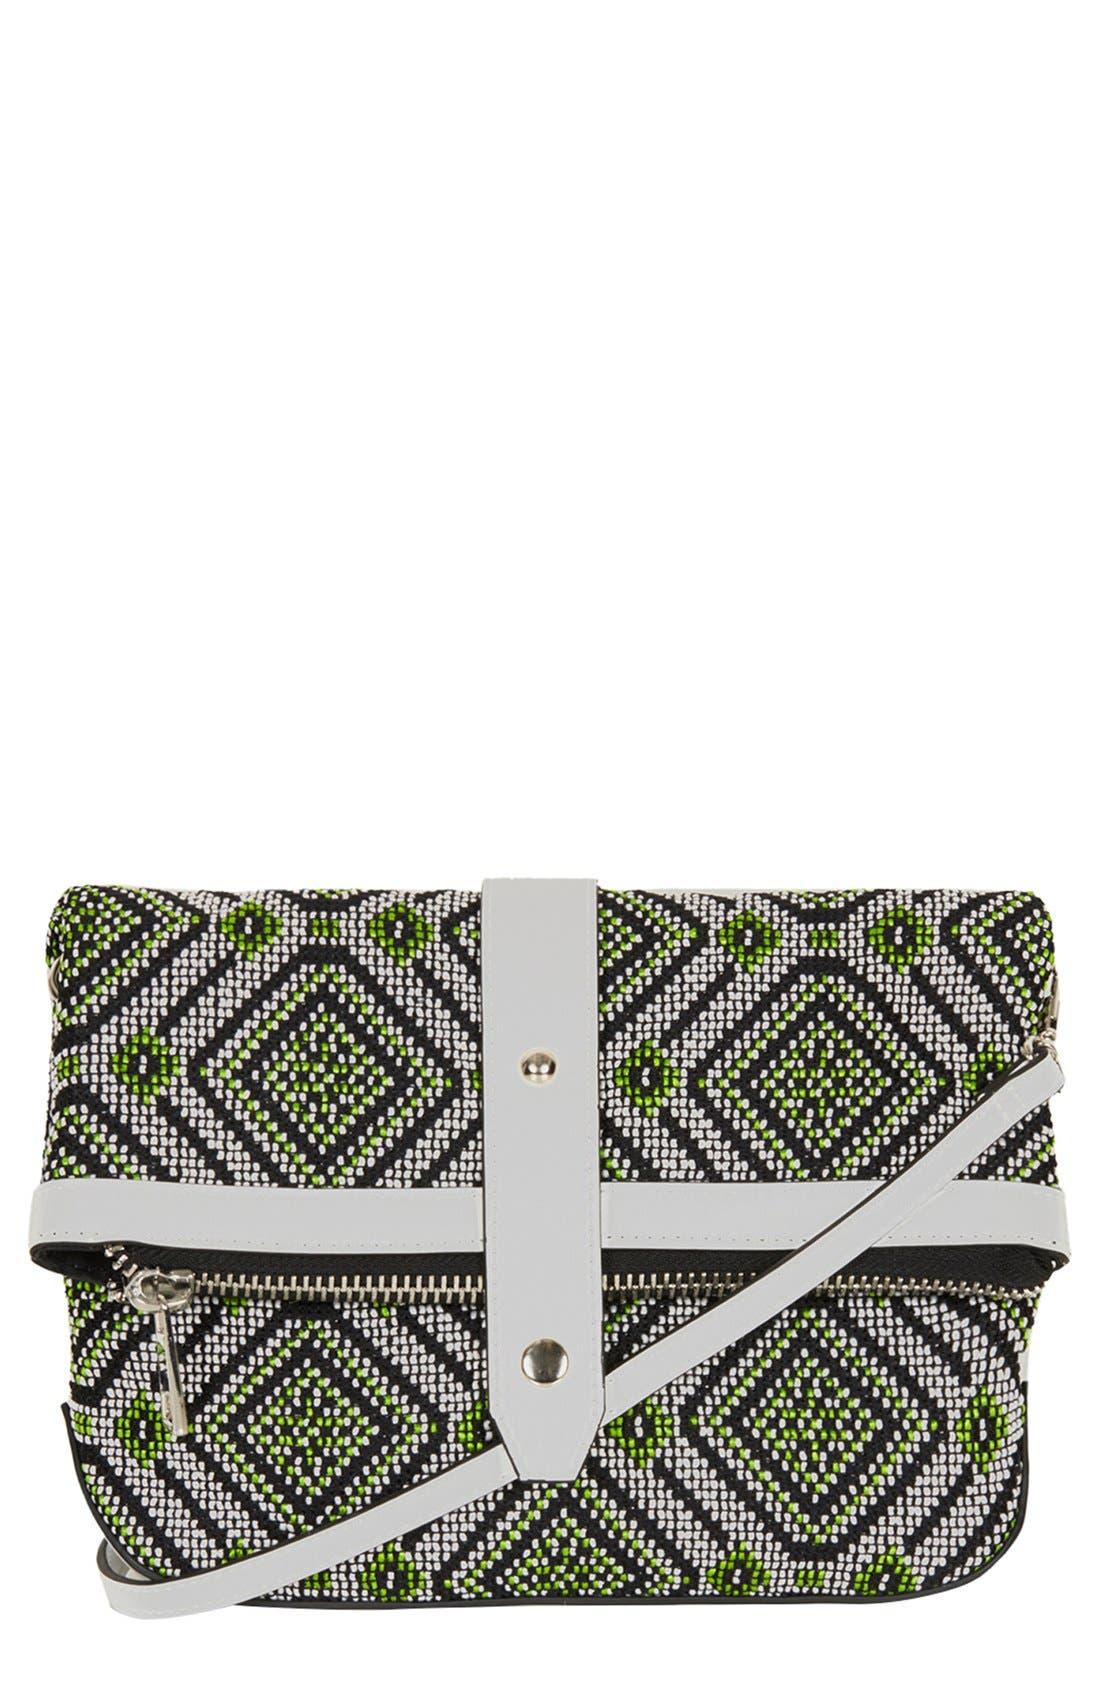 Alternate Image 1 Selected - Topshop Tapestry Crossbody Bag